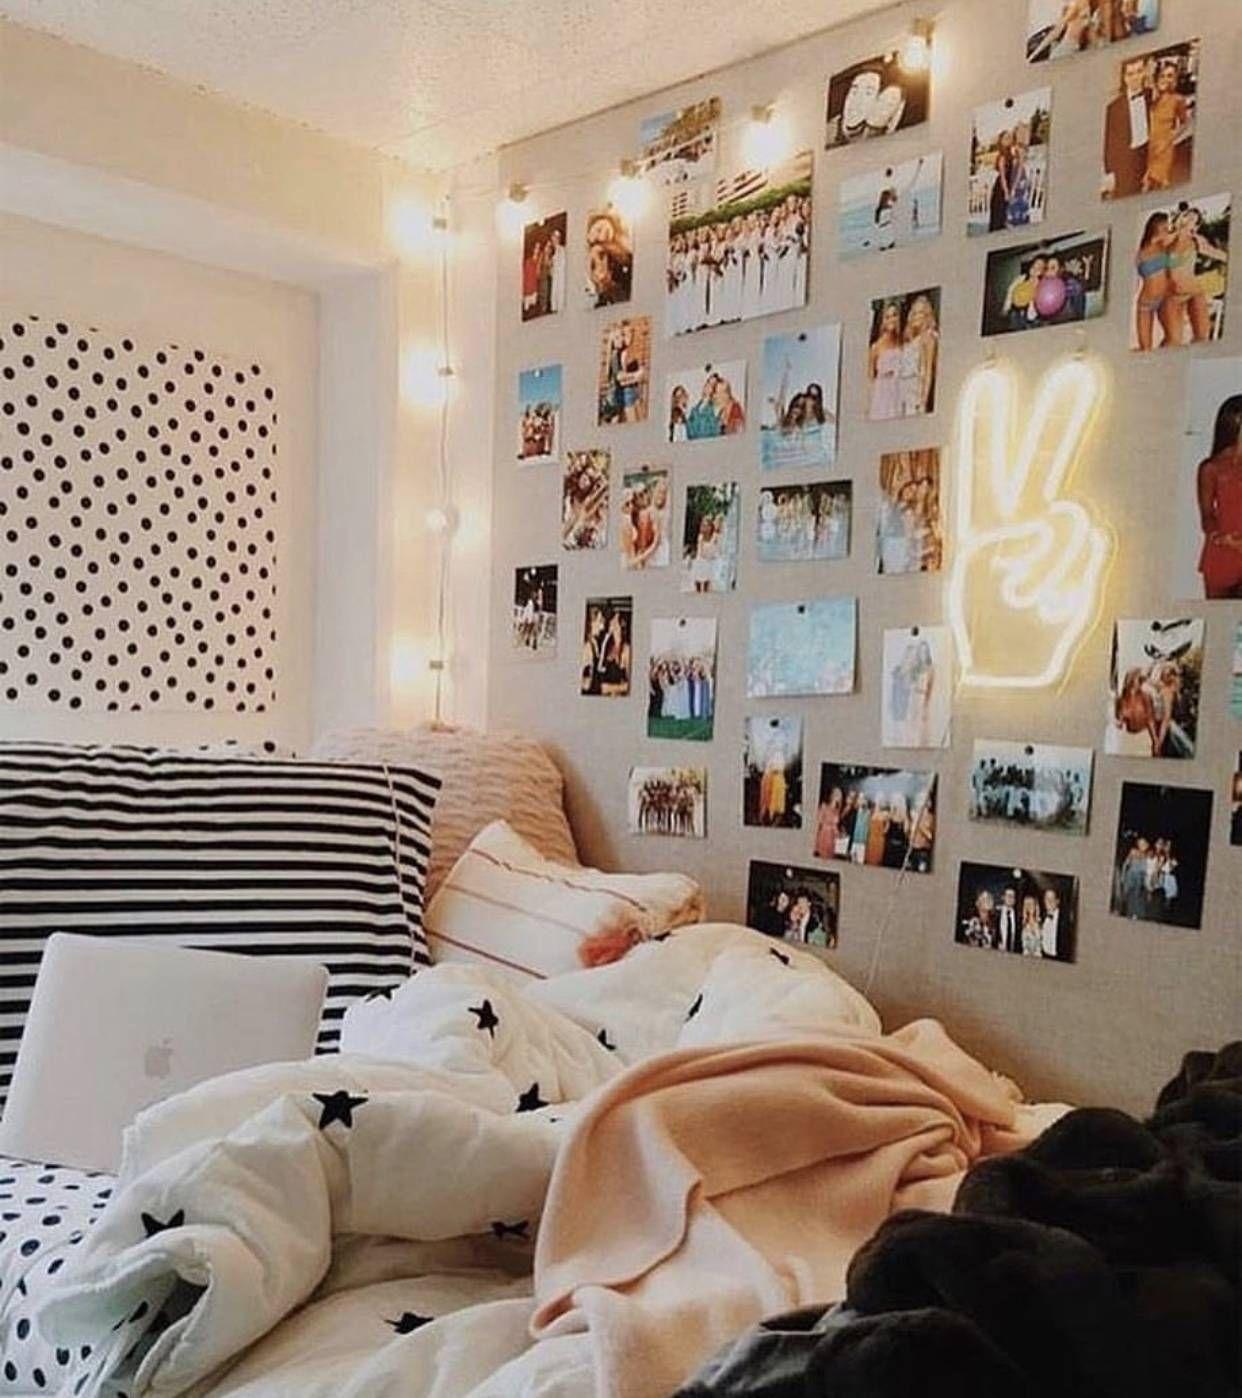 vsco decor ideas - must have decor for a vsco room | room ideas bedroom, dorm room decor, diy